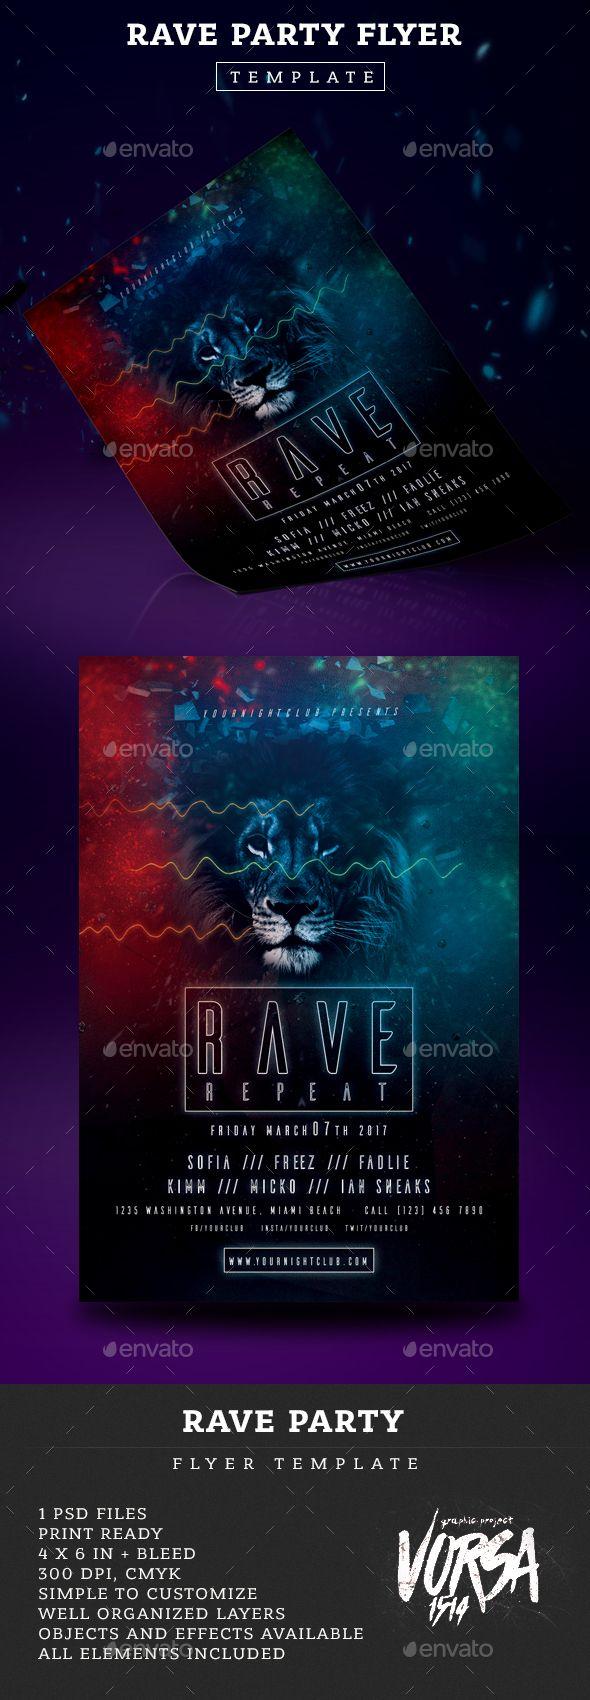 rave party flyer template psd flyer templates pinterest party